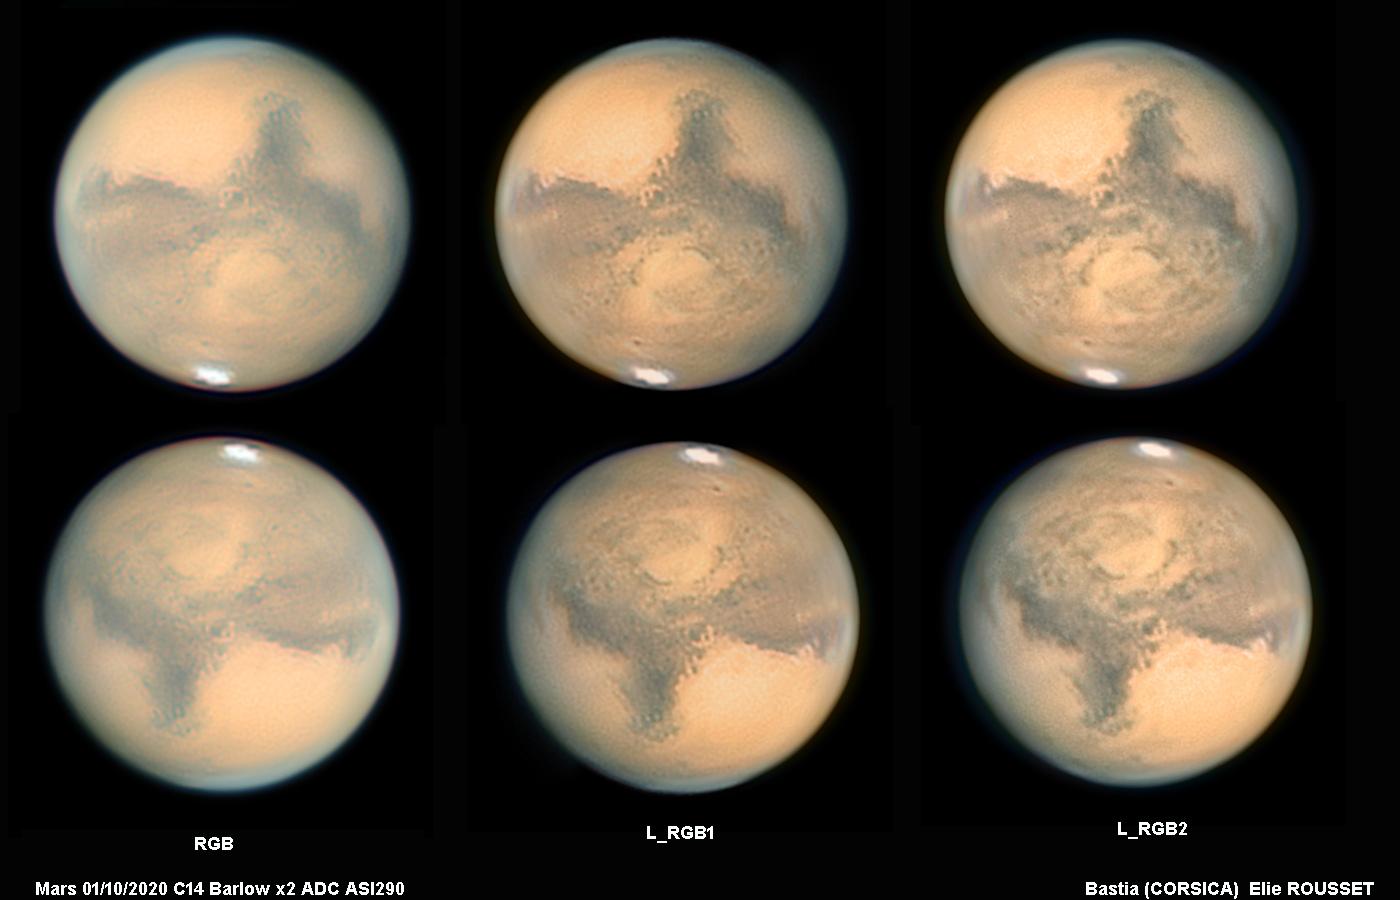 large.Mars-01-10-2020-Planche-RGB.jpg.442fdd56dc3f48ef6a9425392179168c.jpg